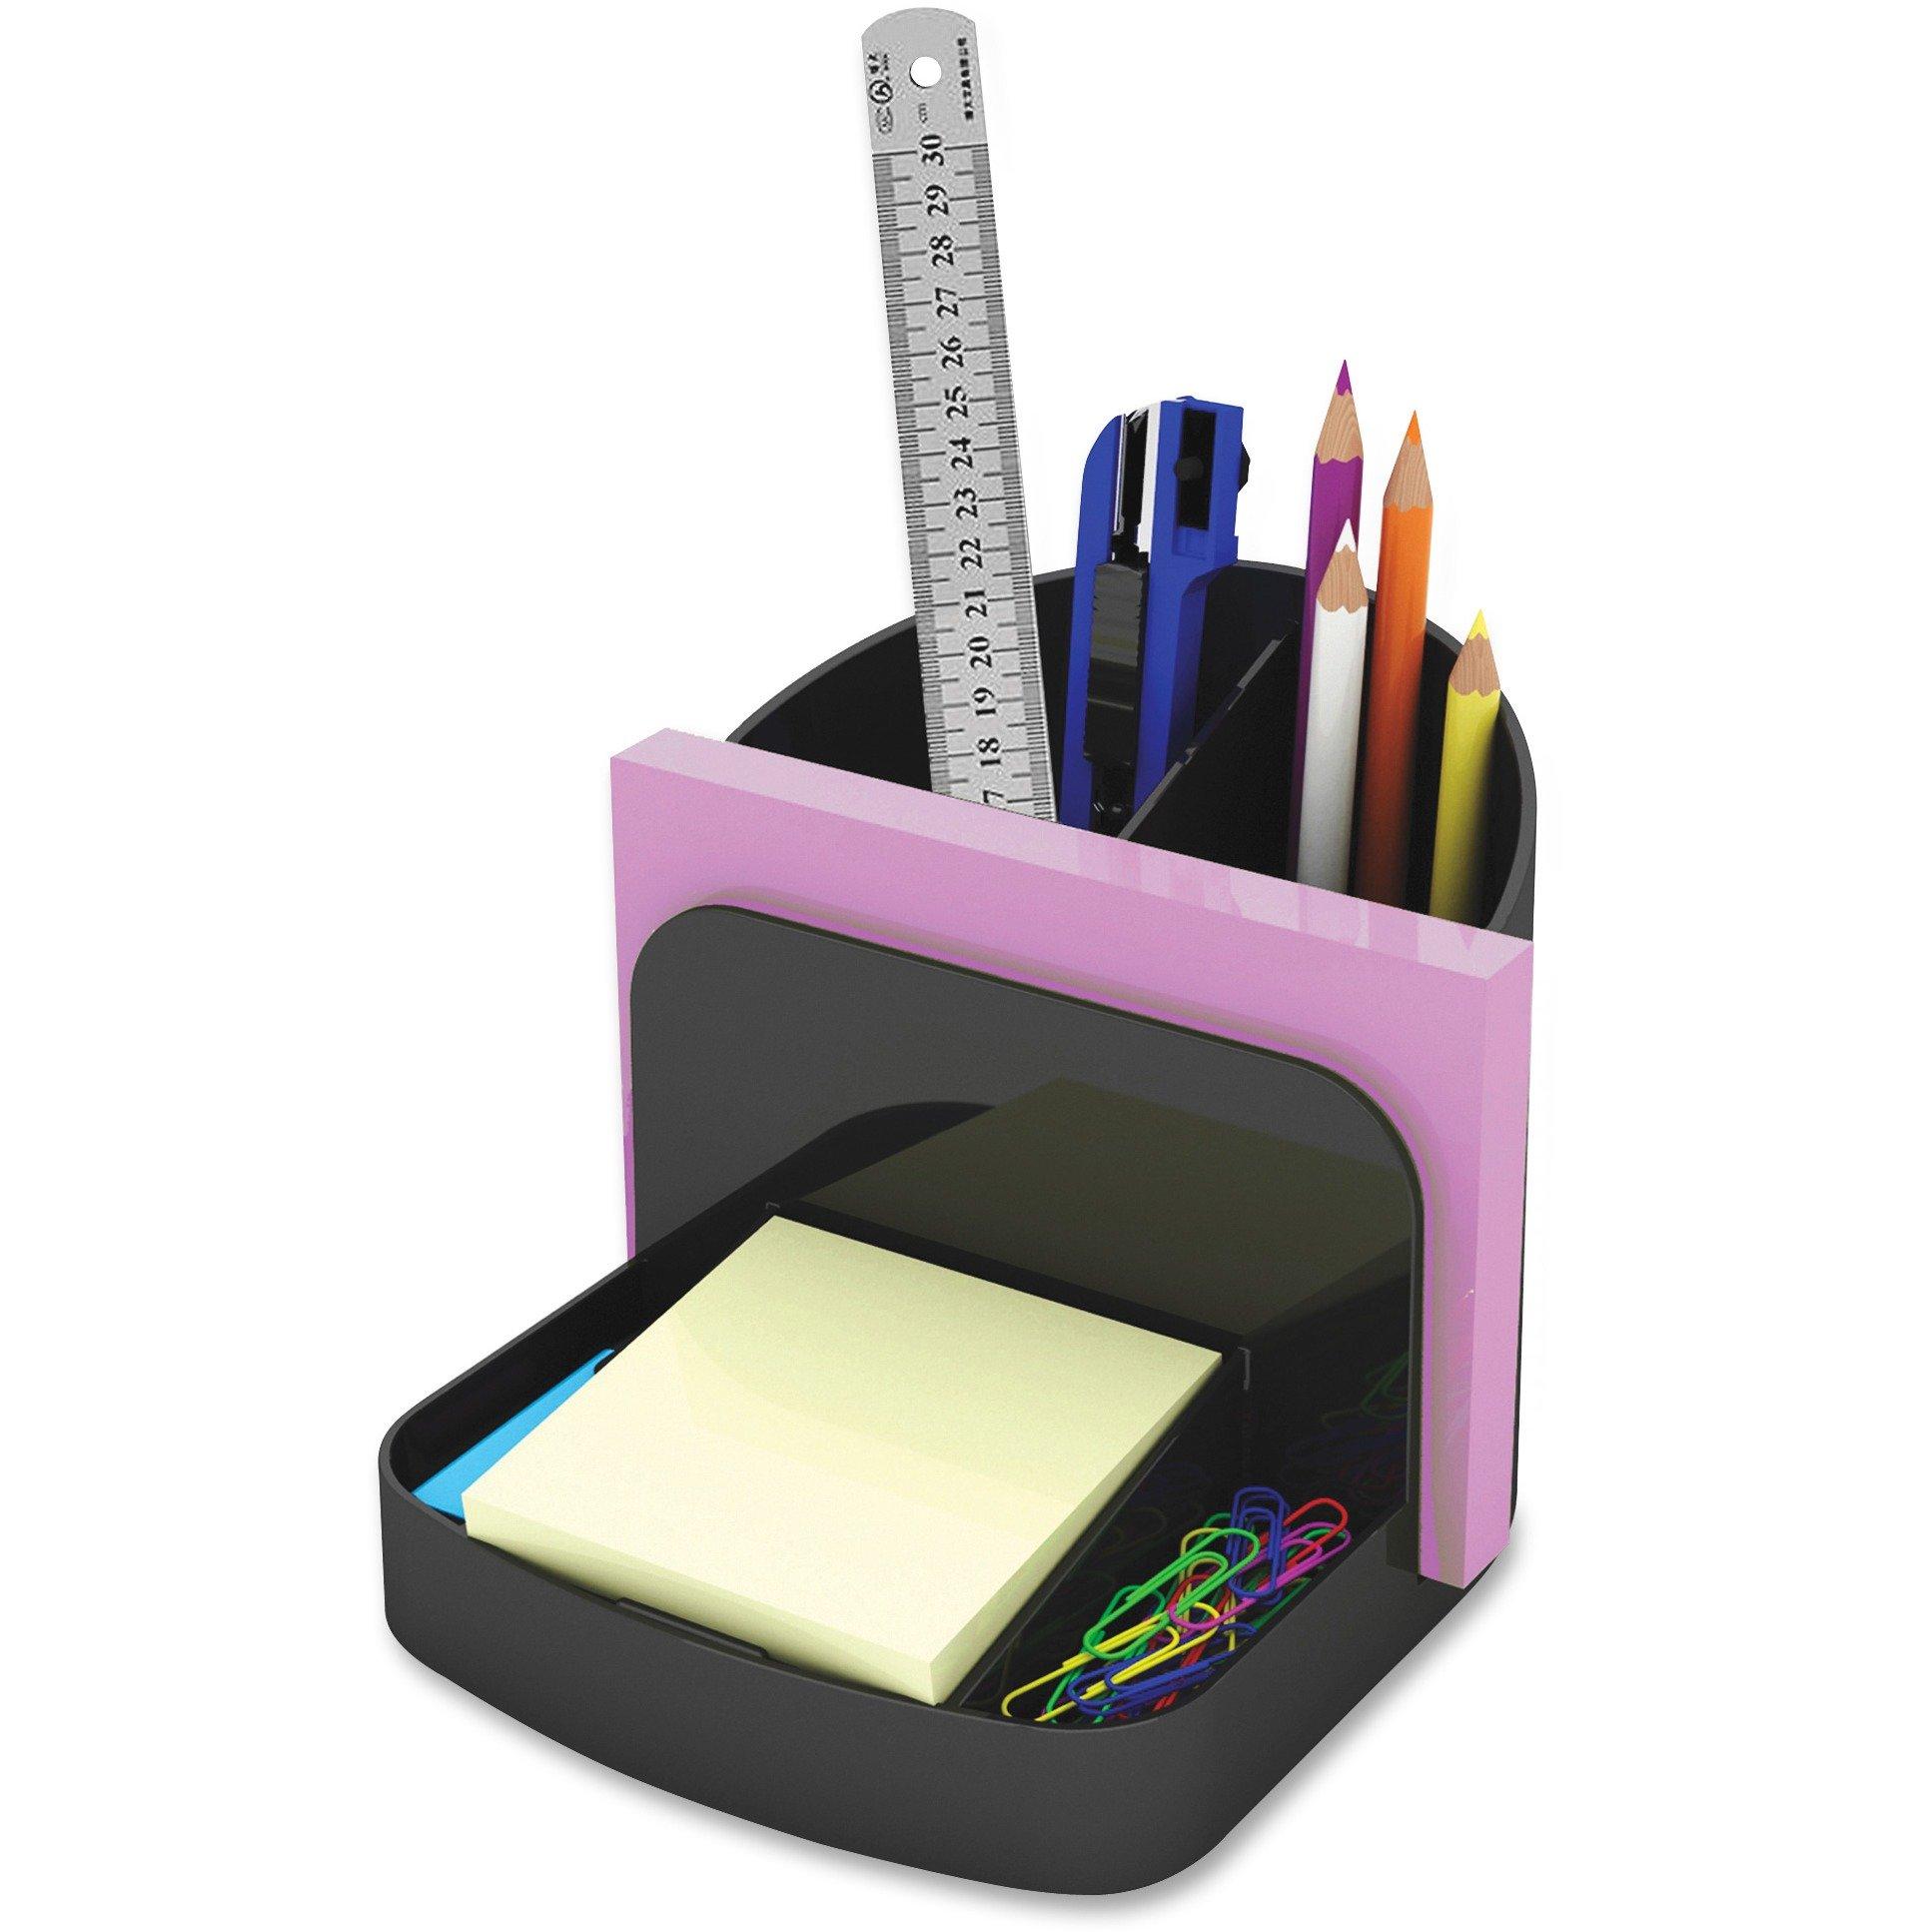 "Deflect-o Desk Caddy Organizer - Desktop, Shelf - 5"" Height x 5.4"" Width x 6.8"" Depth - Plastic - Black"